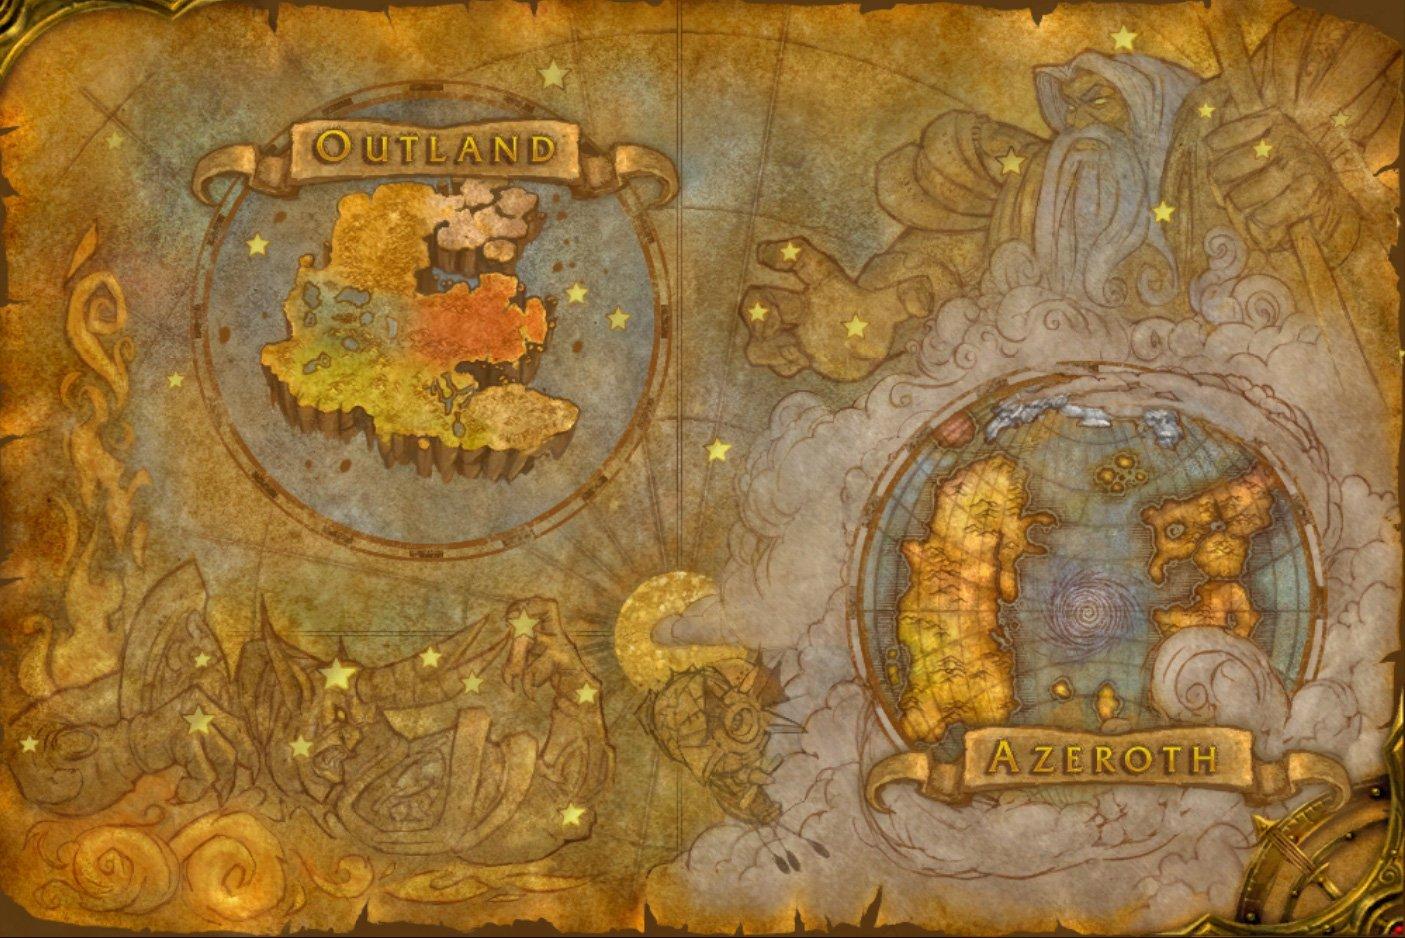 Sargeras on world map?